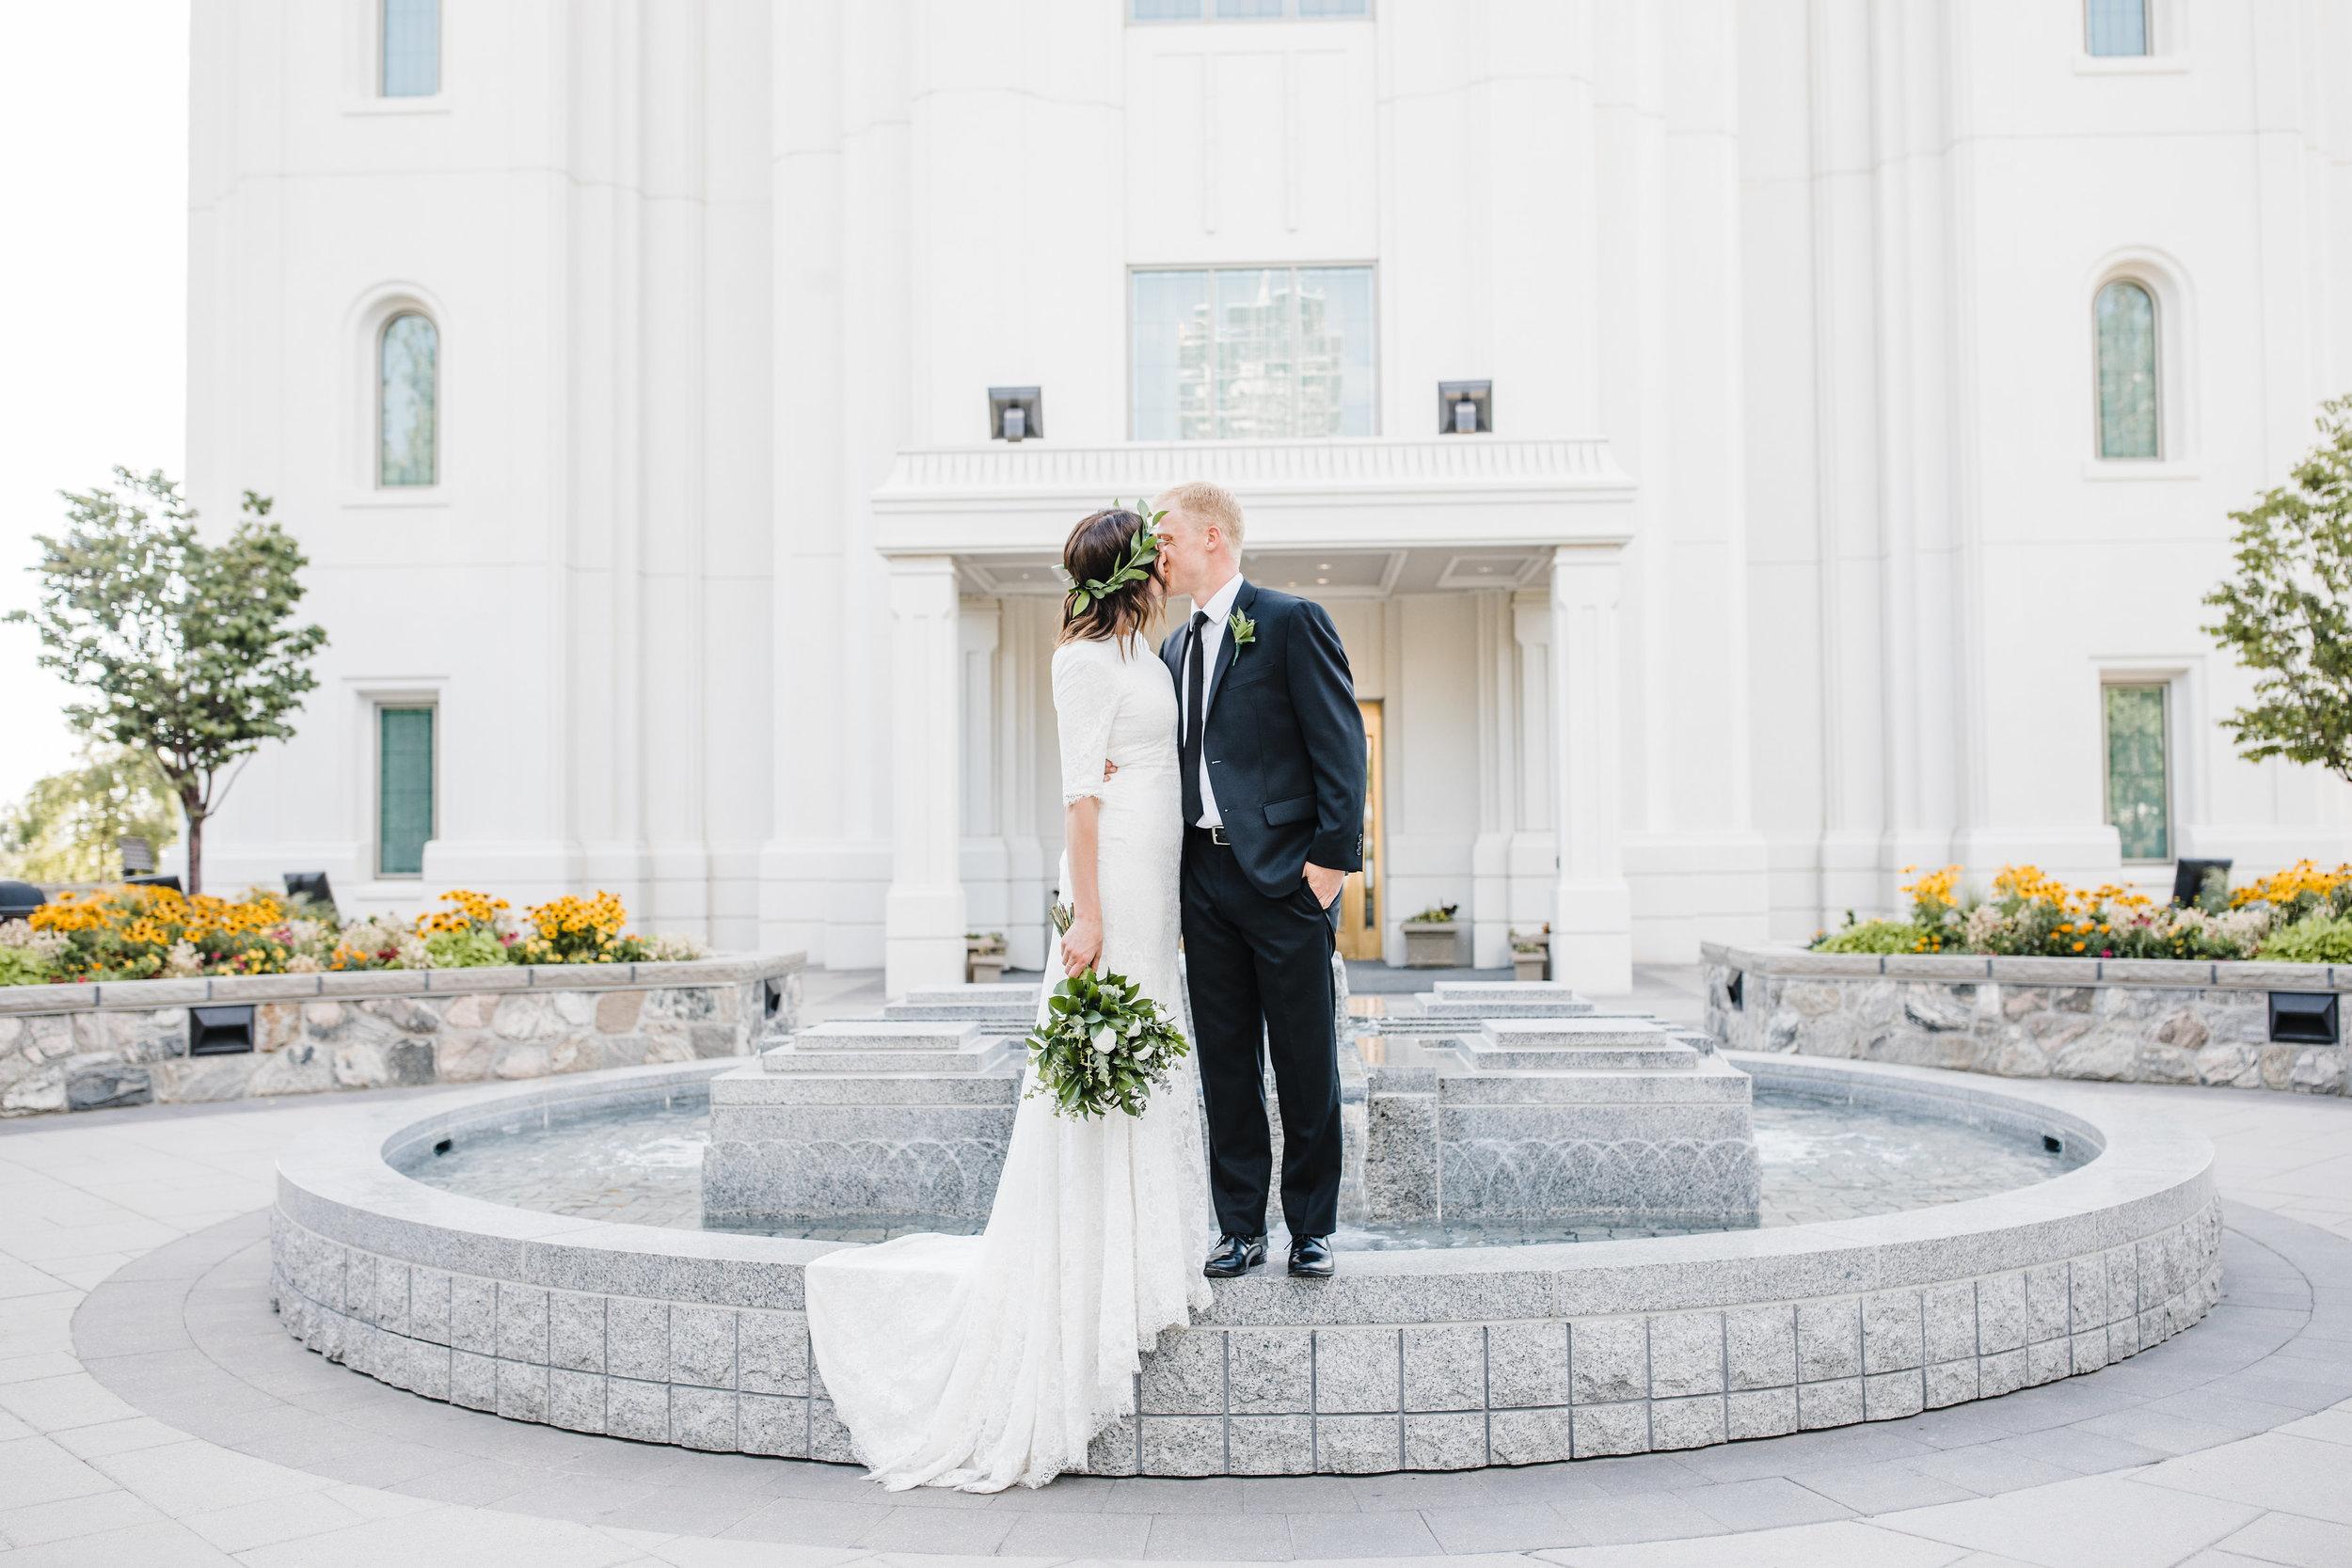 wedding photographer in brigham city utah kissing romantic temple lds fountain